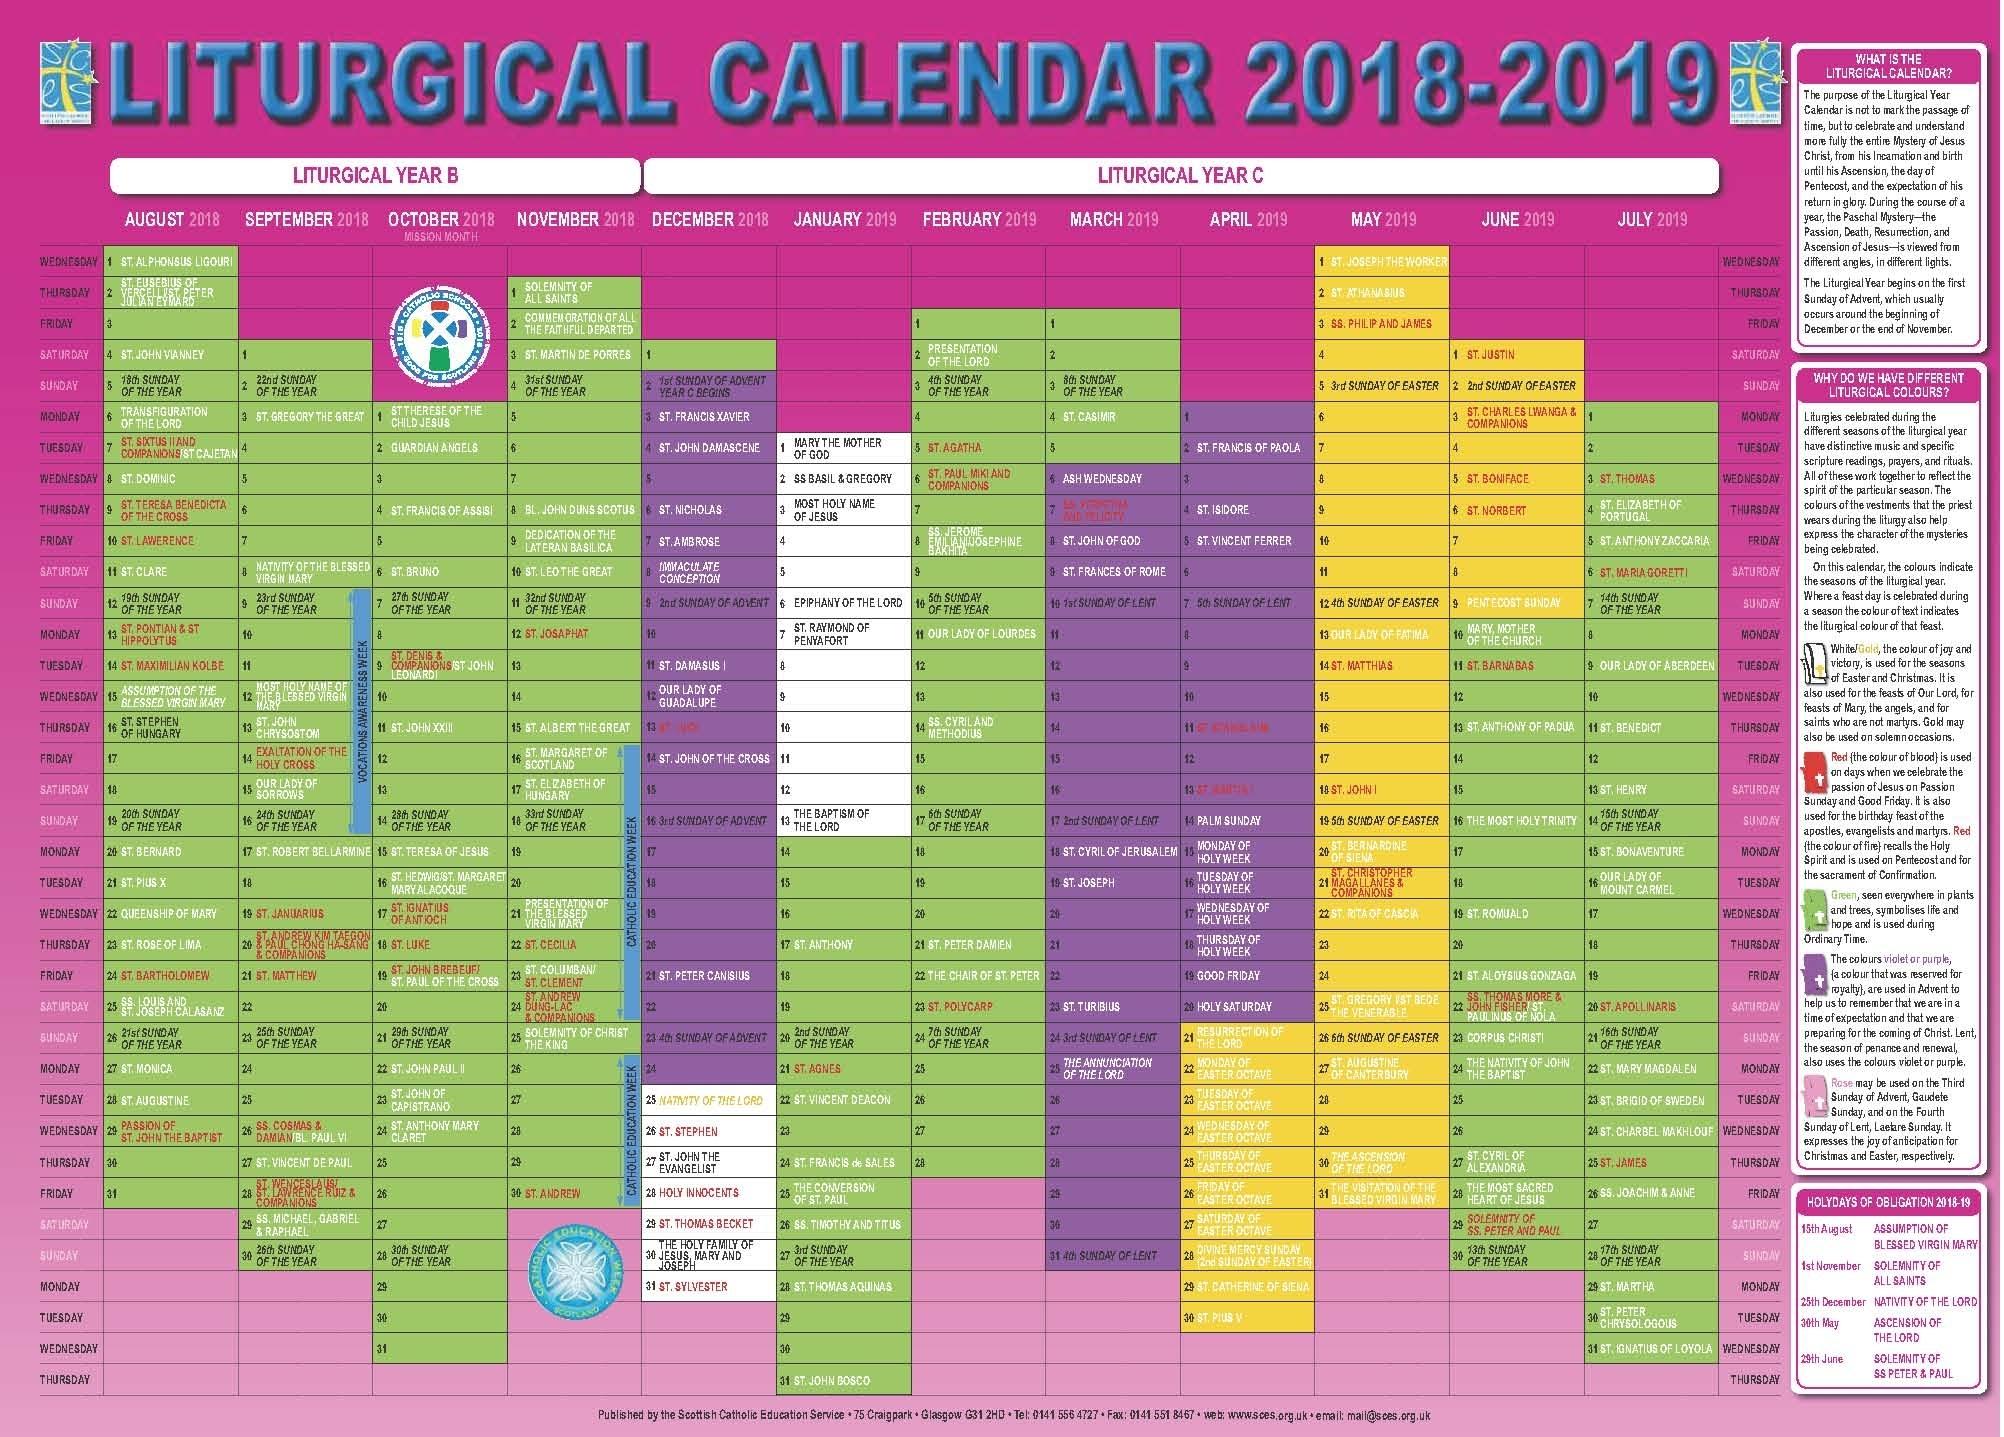 Scottish Catholic Education Service | Sces | Liturgical Calendar pertaining to Teaching The Catholic Liturgical Calendar